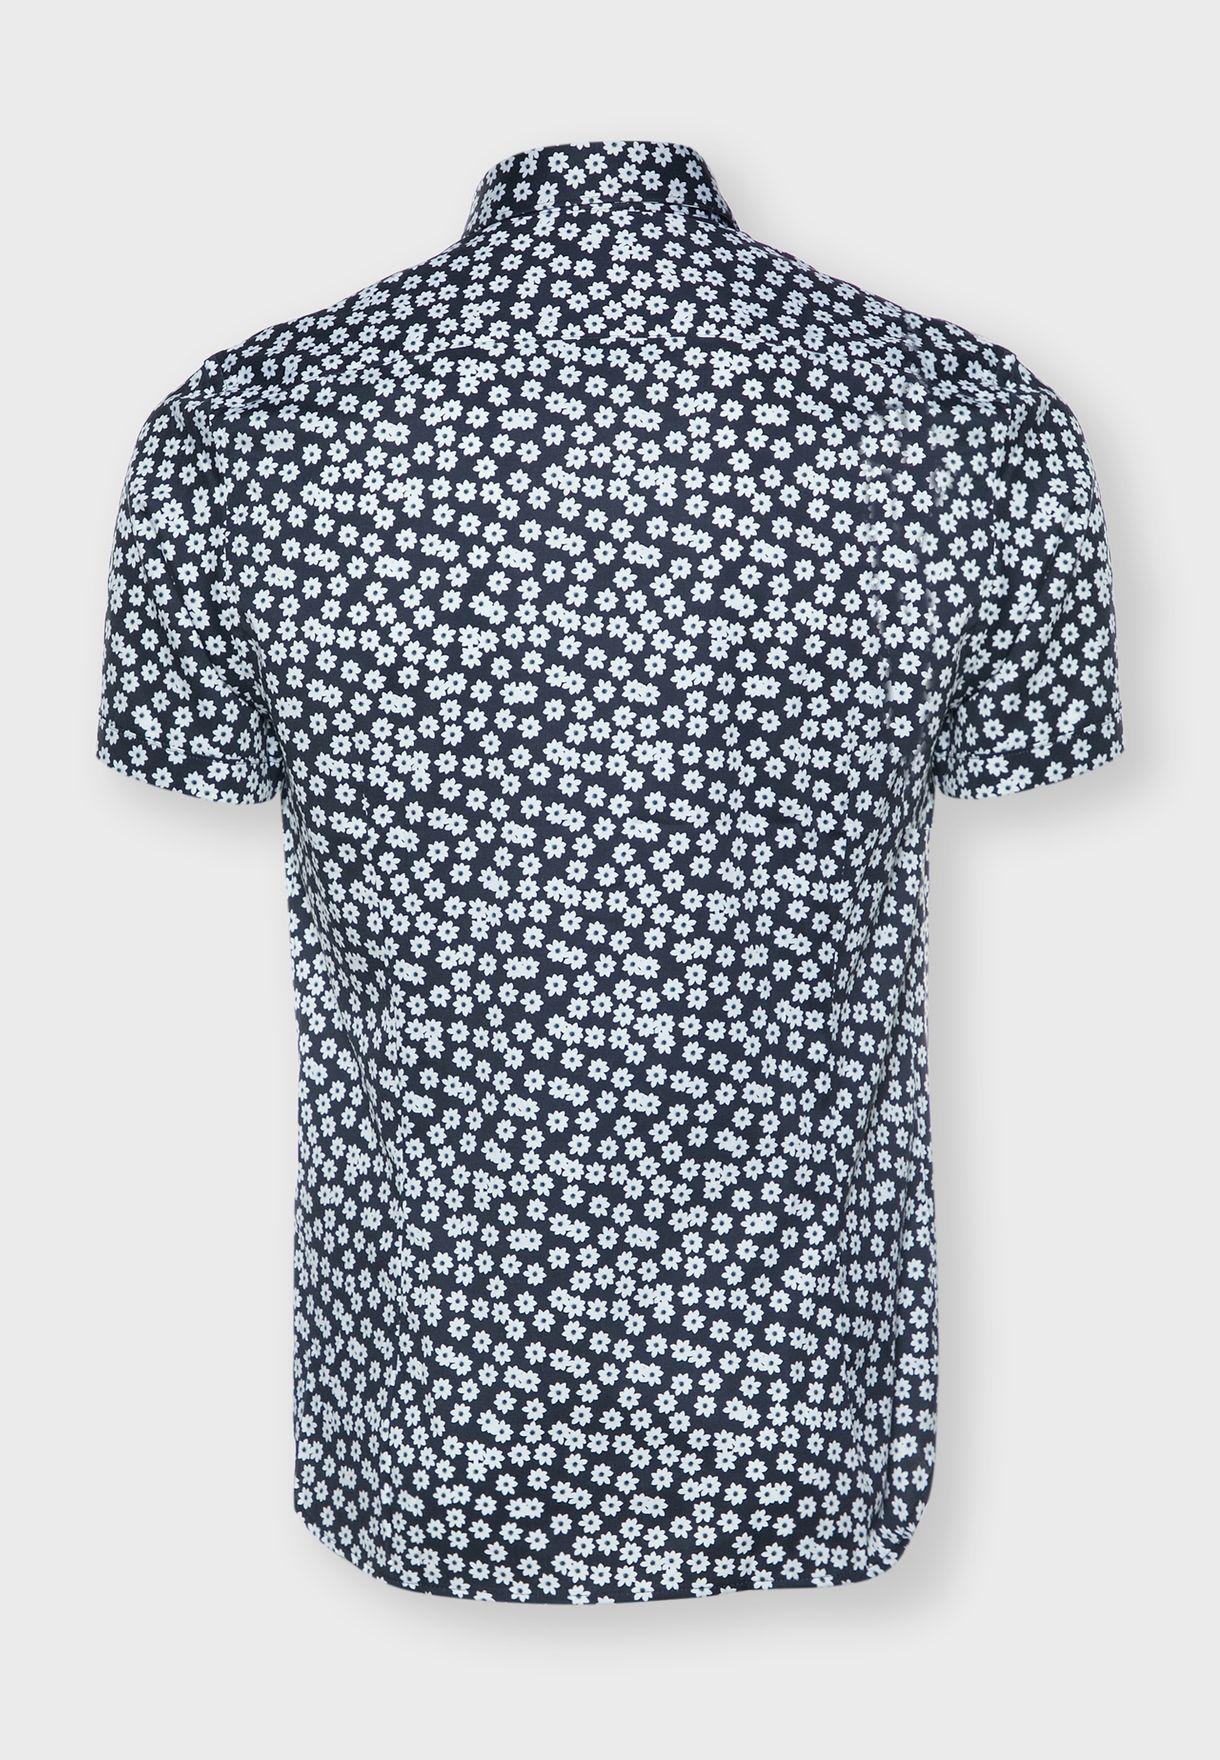 قميص بطبعات اوراق ازهار